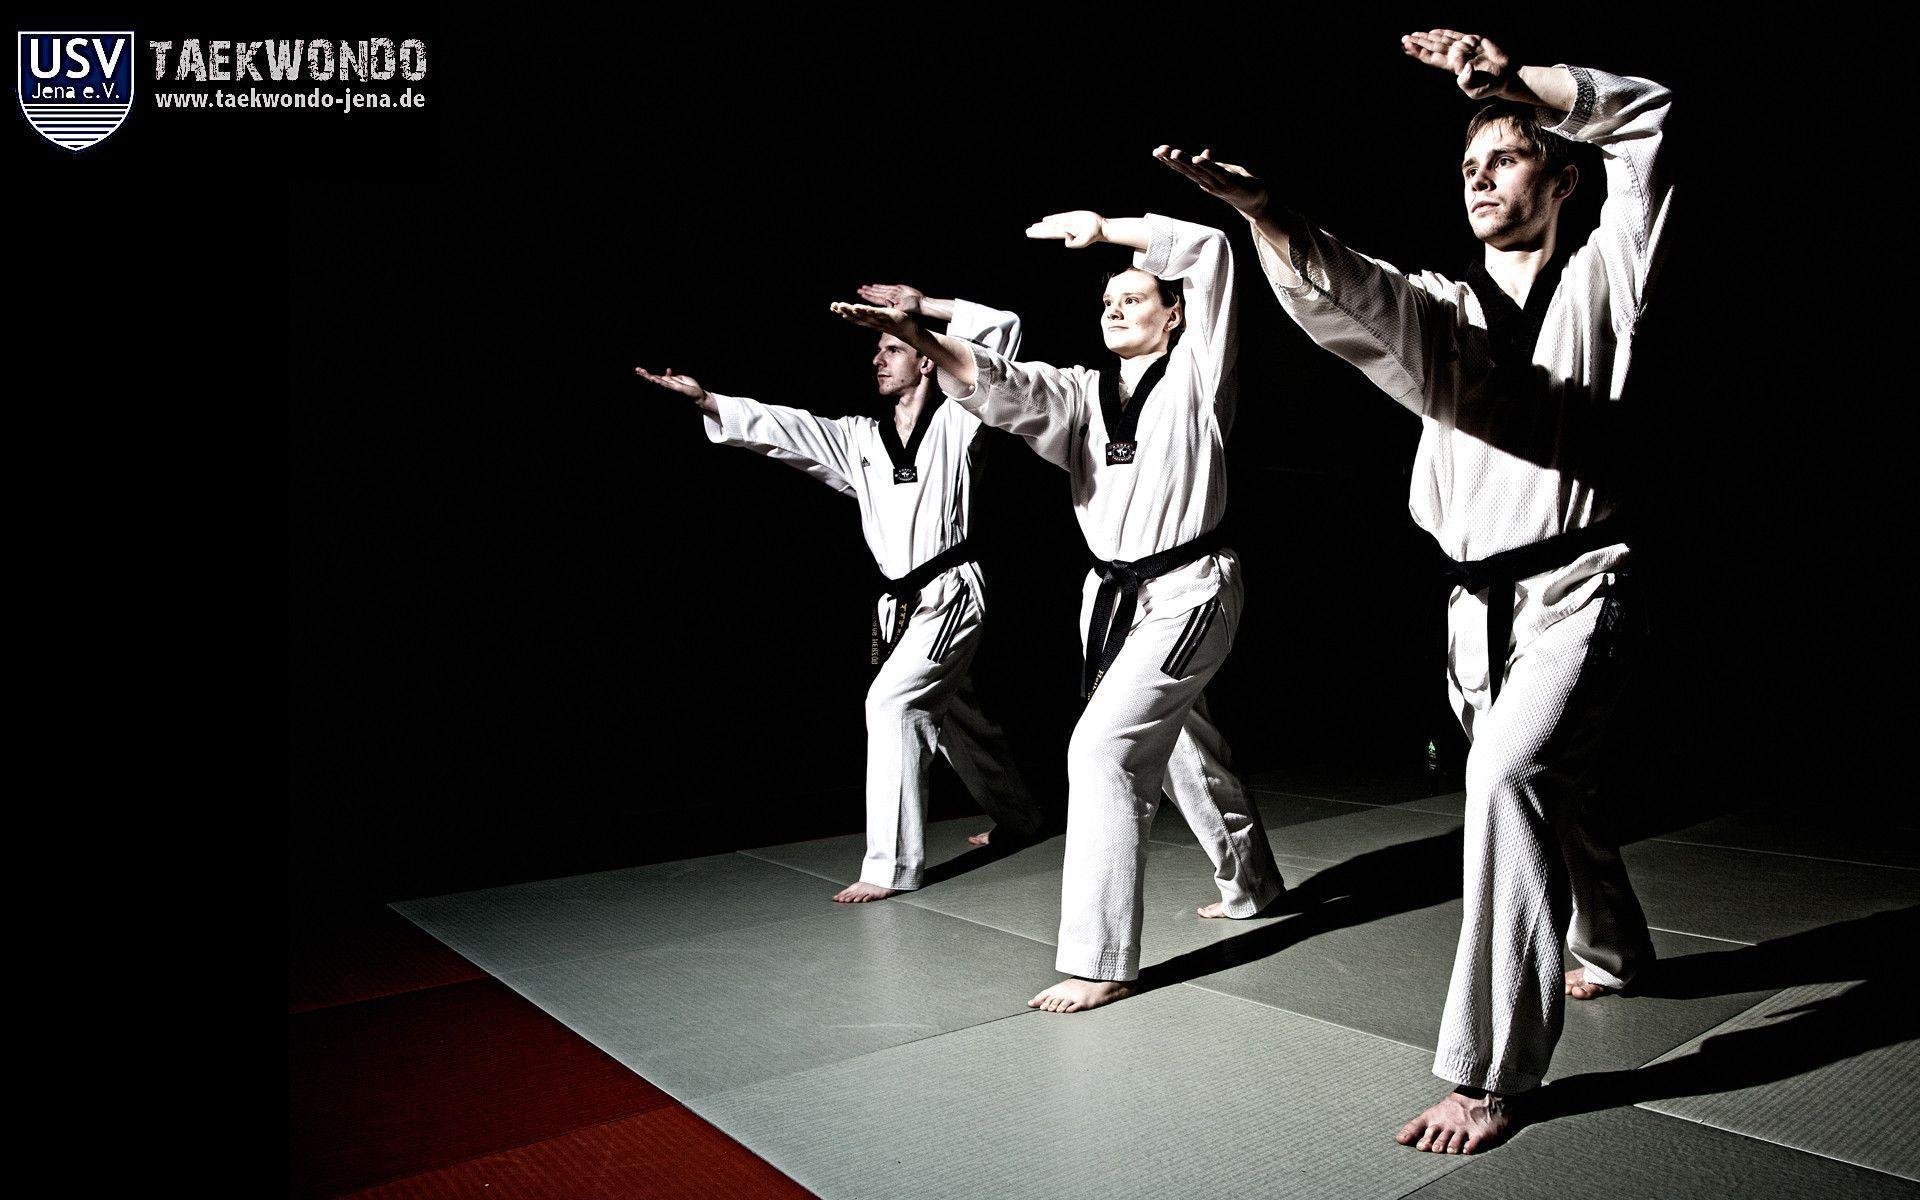 Taekwondo Wallpapers 1920x1200